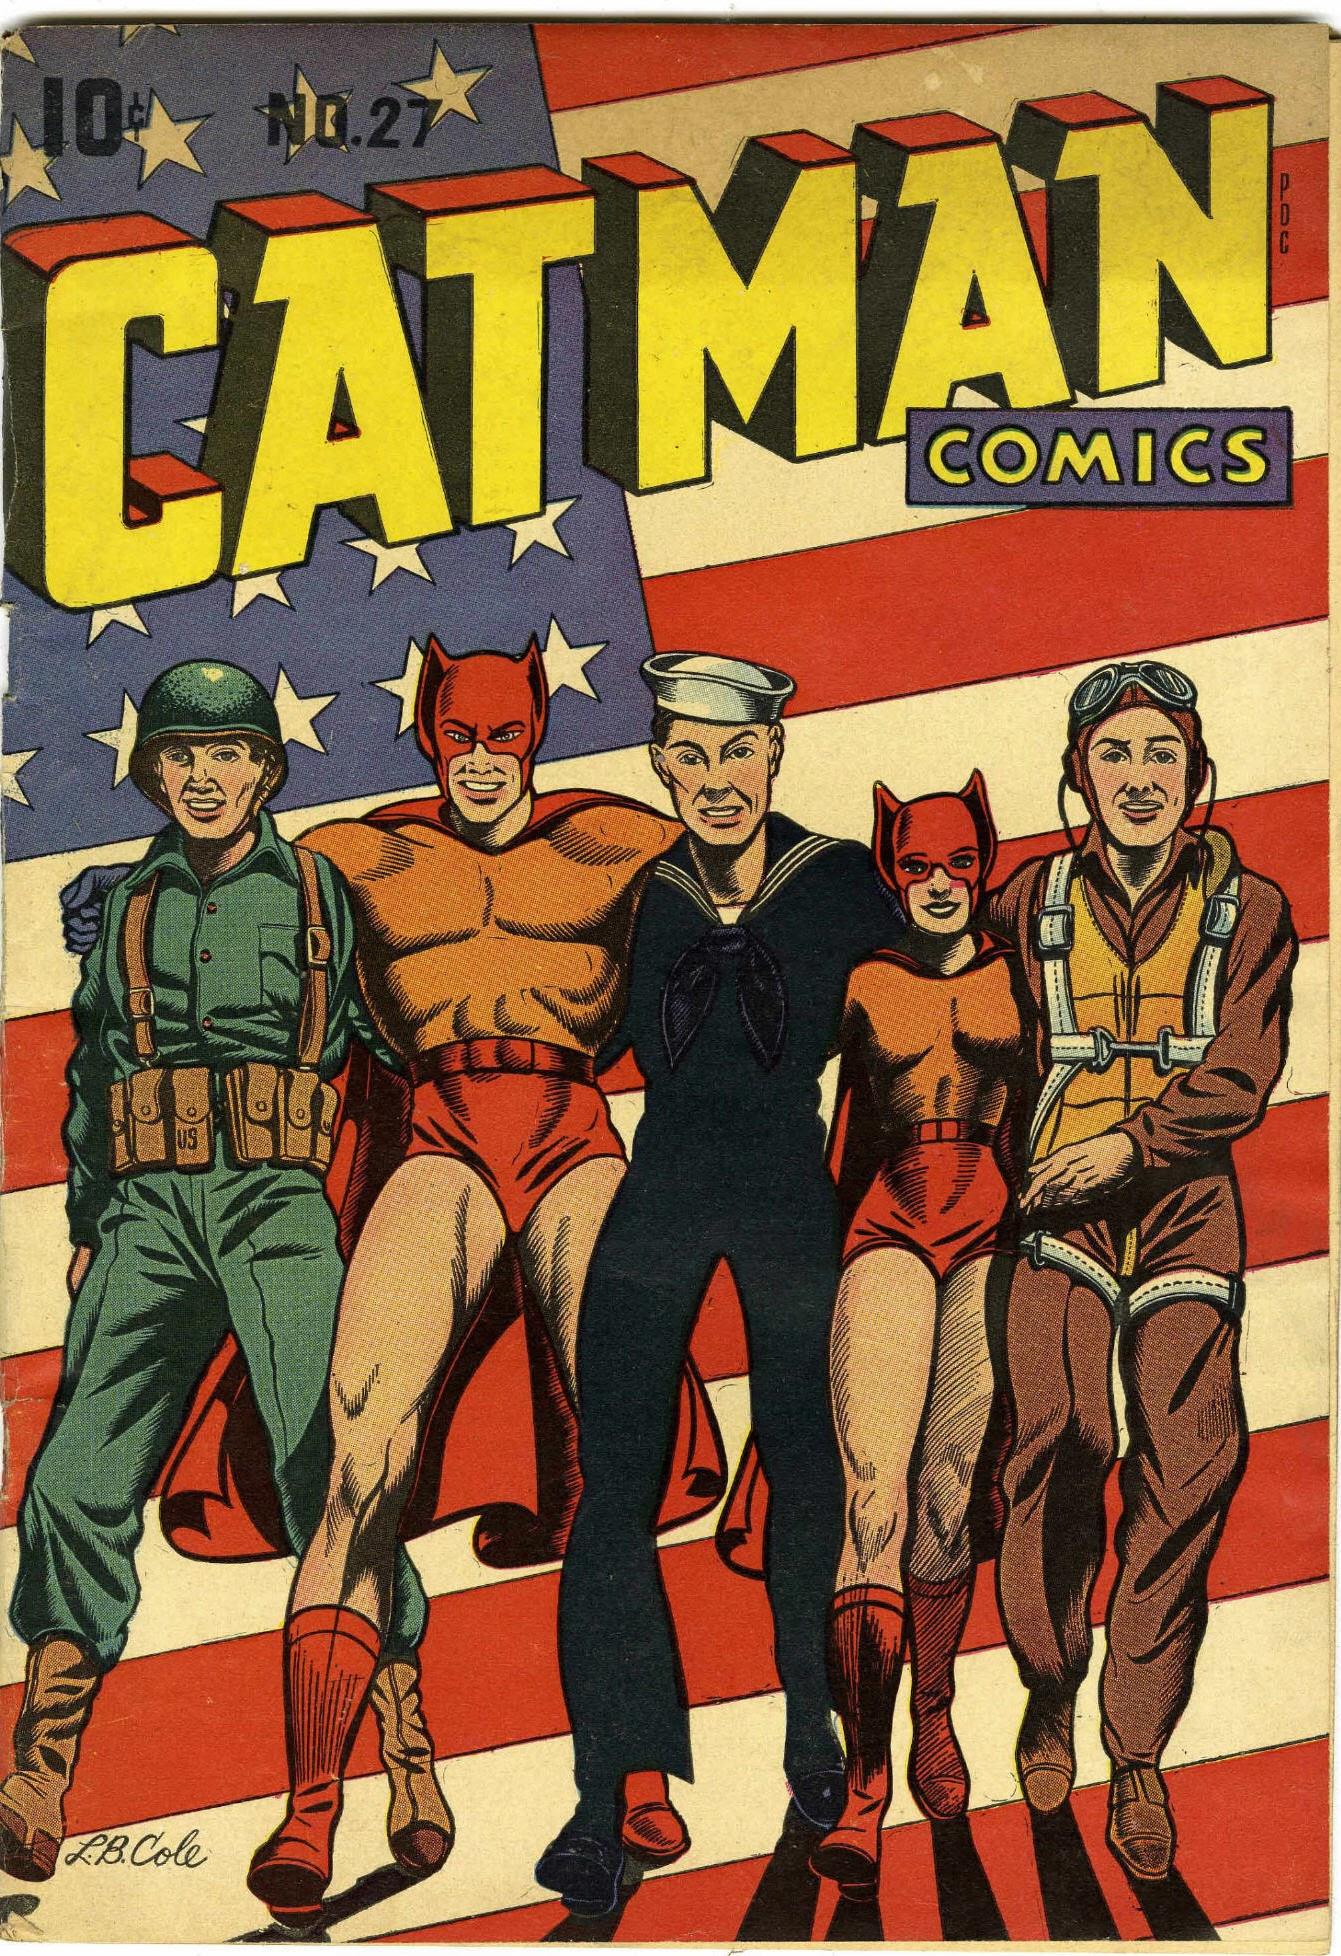 Cat-Man Comics 27 Page 1